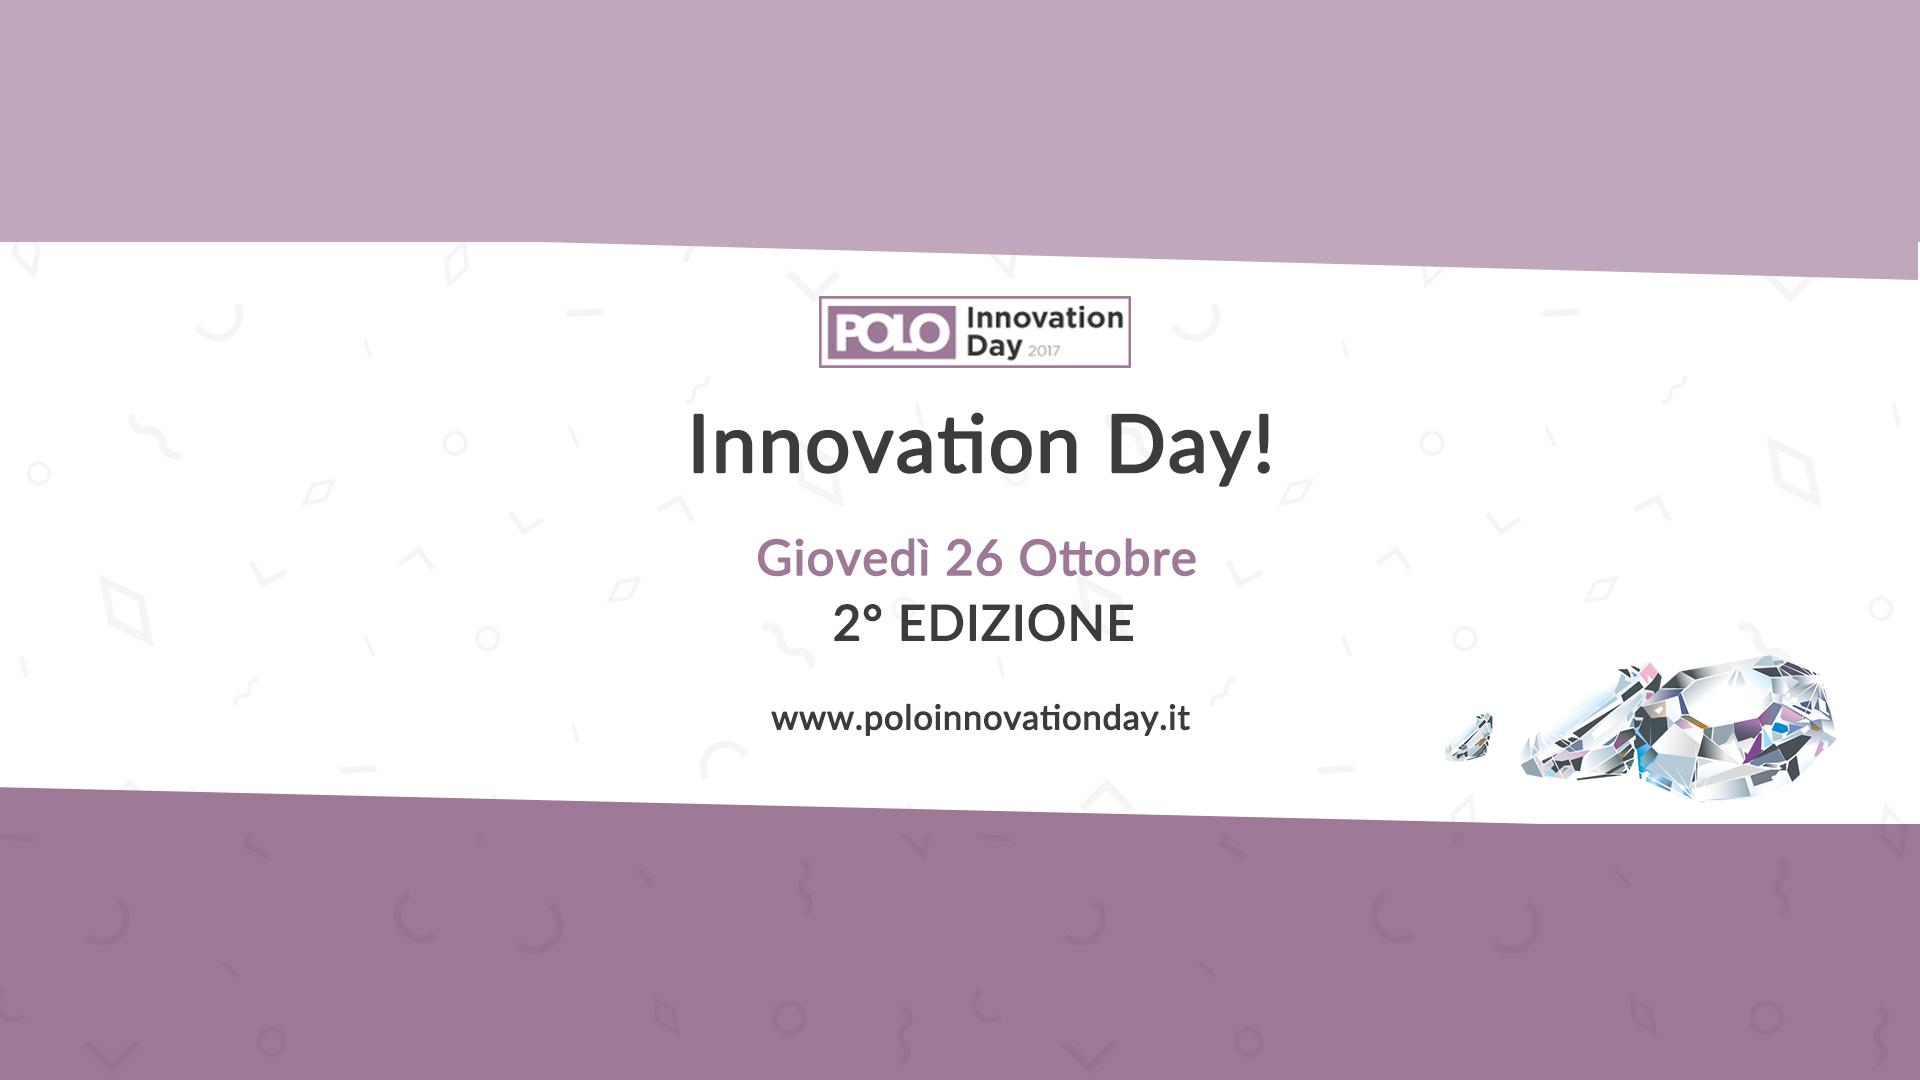 innovation-day-150917